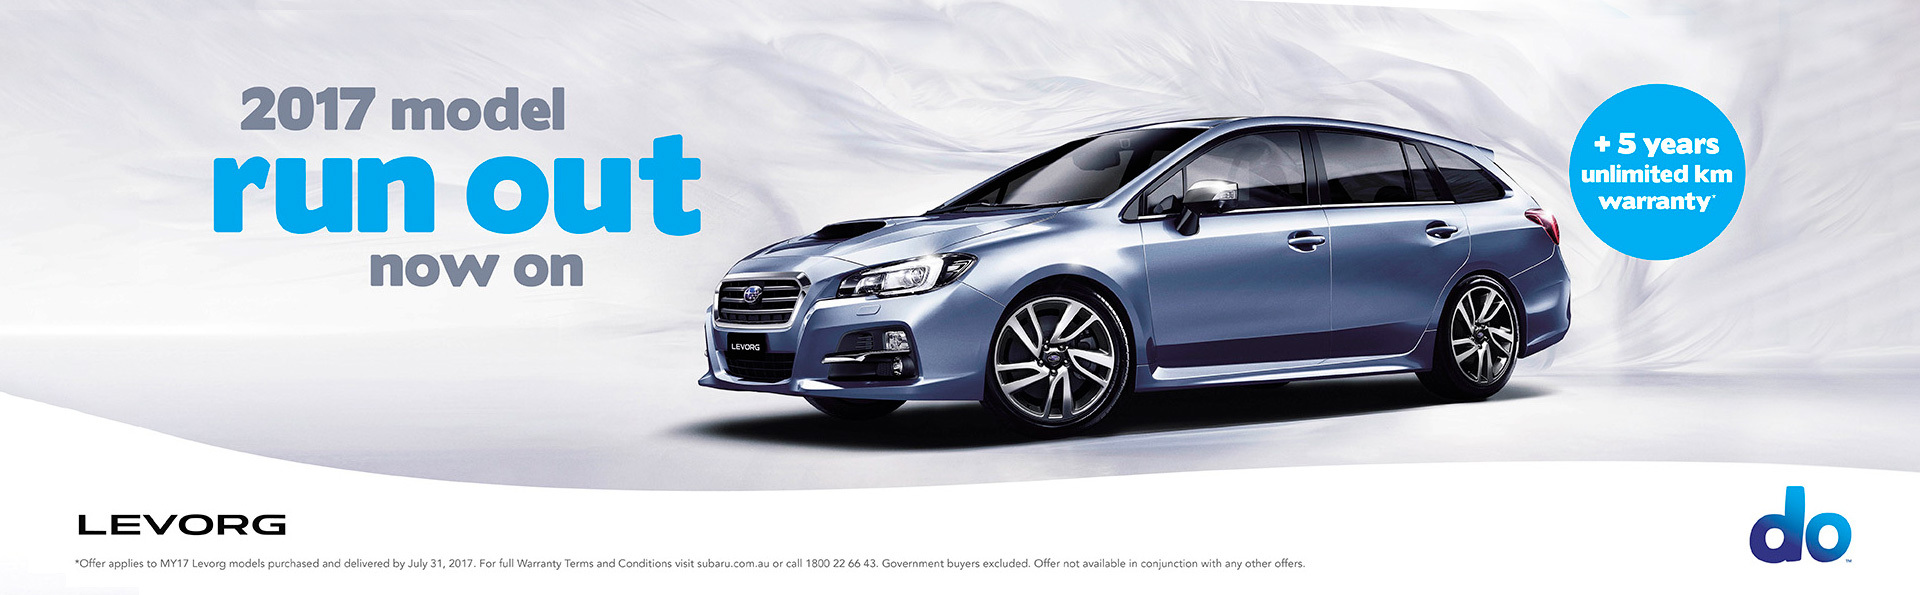 Subaru - National Offer -2017 Levorg Run Out Sale